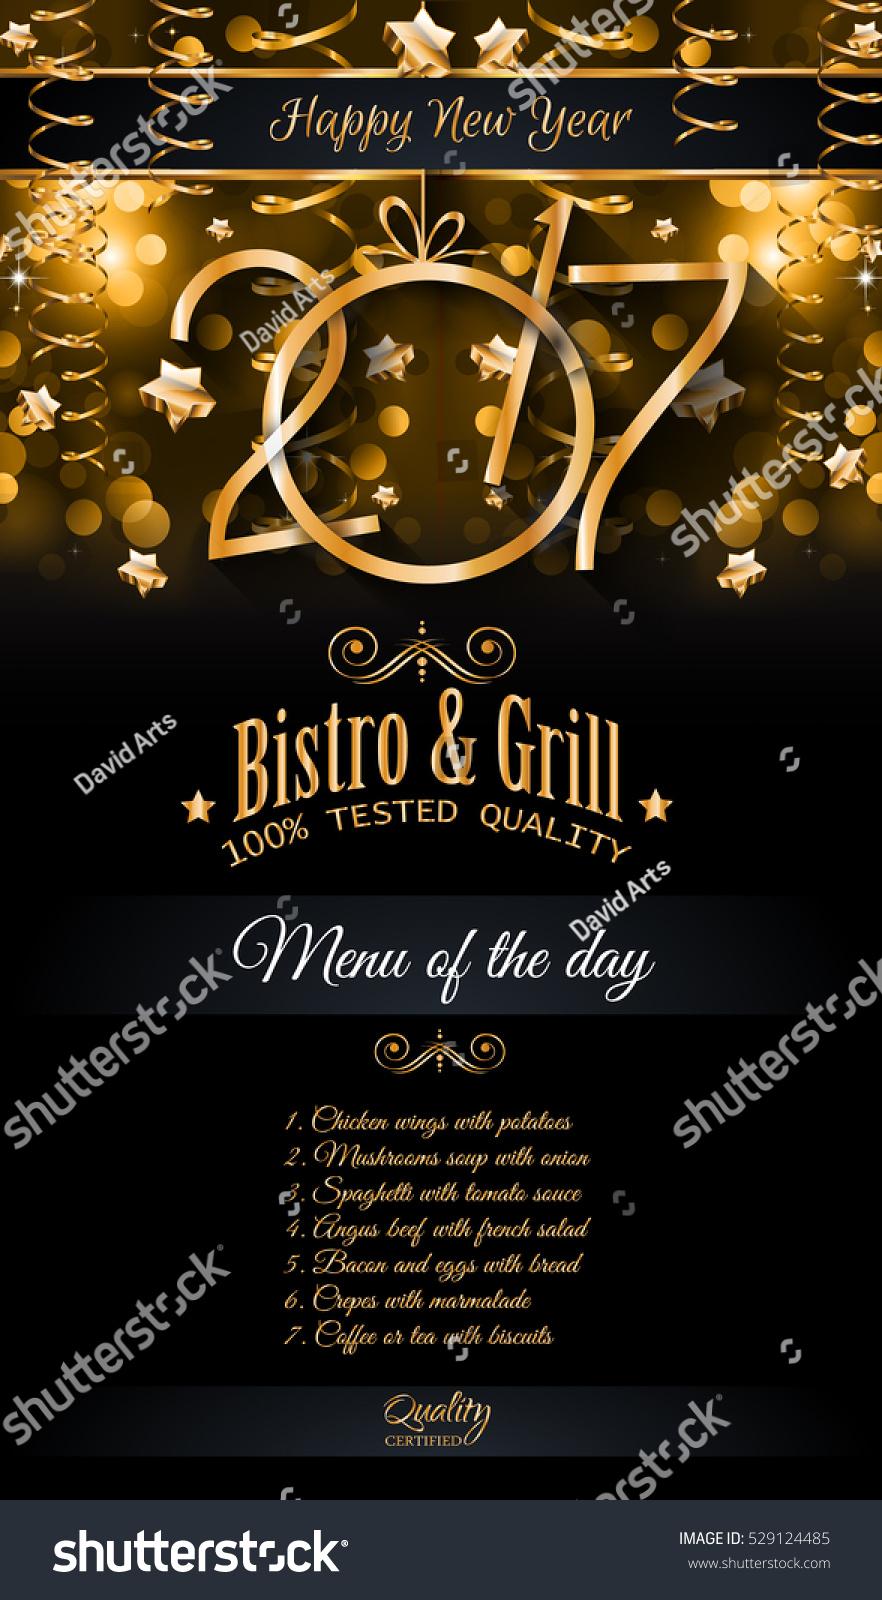 2017 happy new year restaurant menu stock vector 529124485